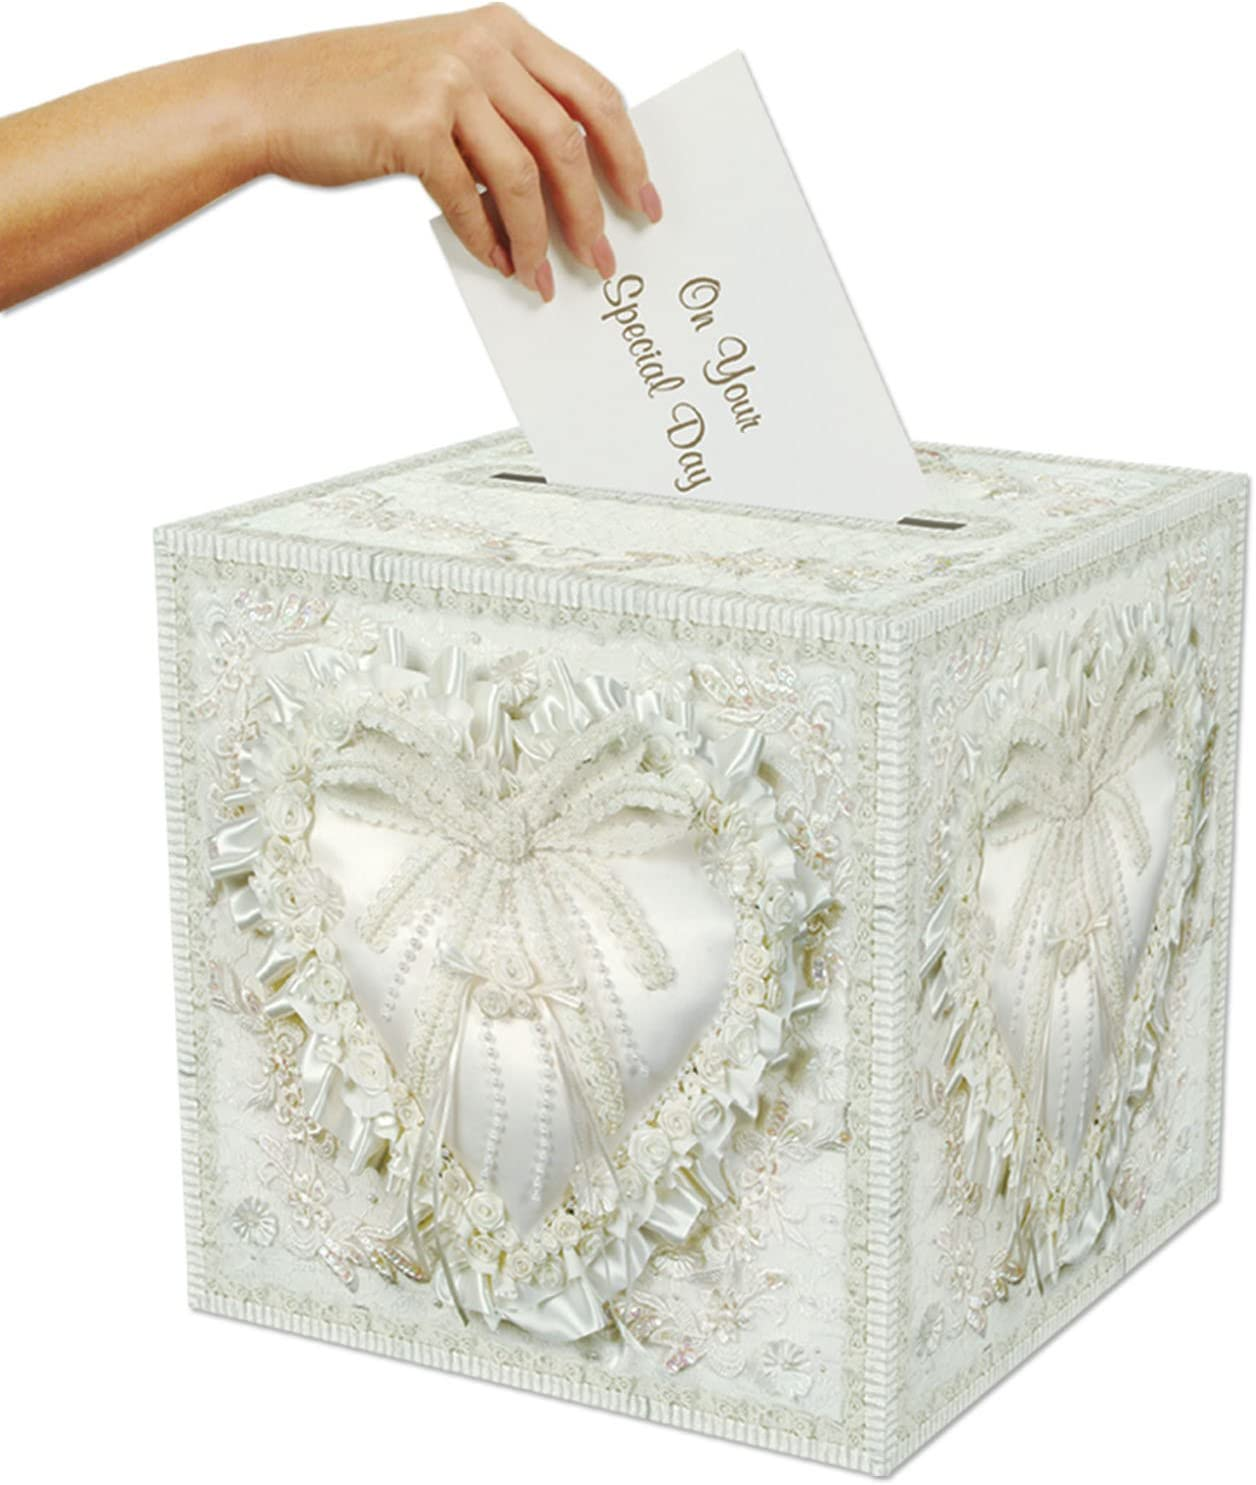 "Beistle 50360 Card Box, 12"" x 12"",White"